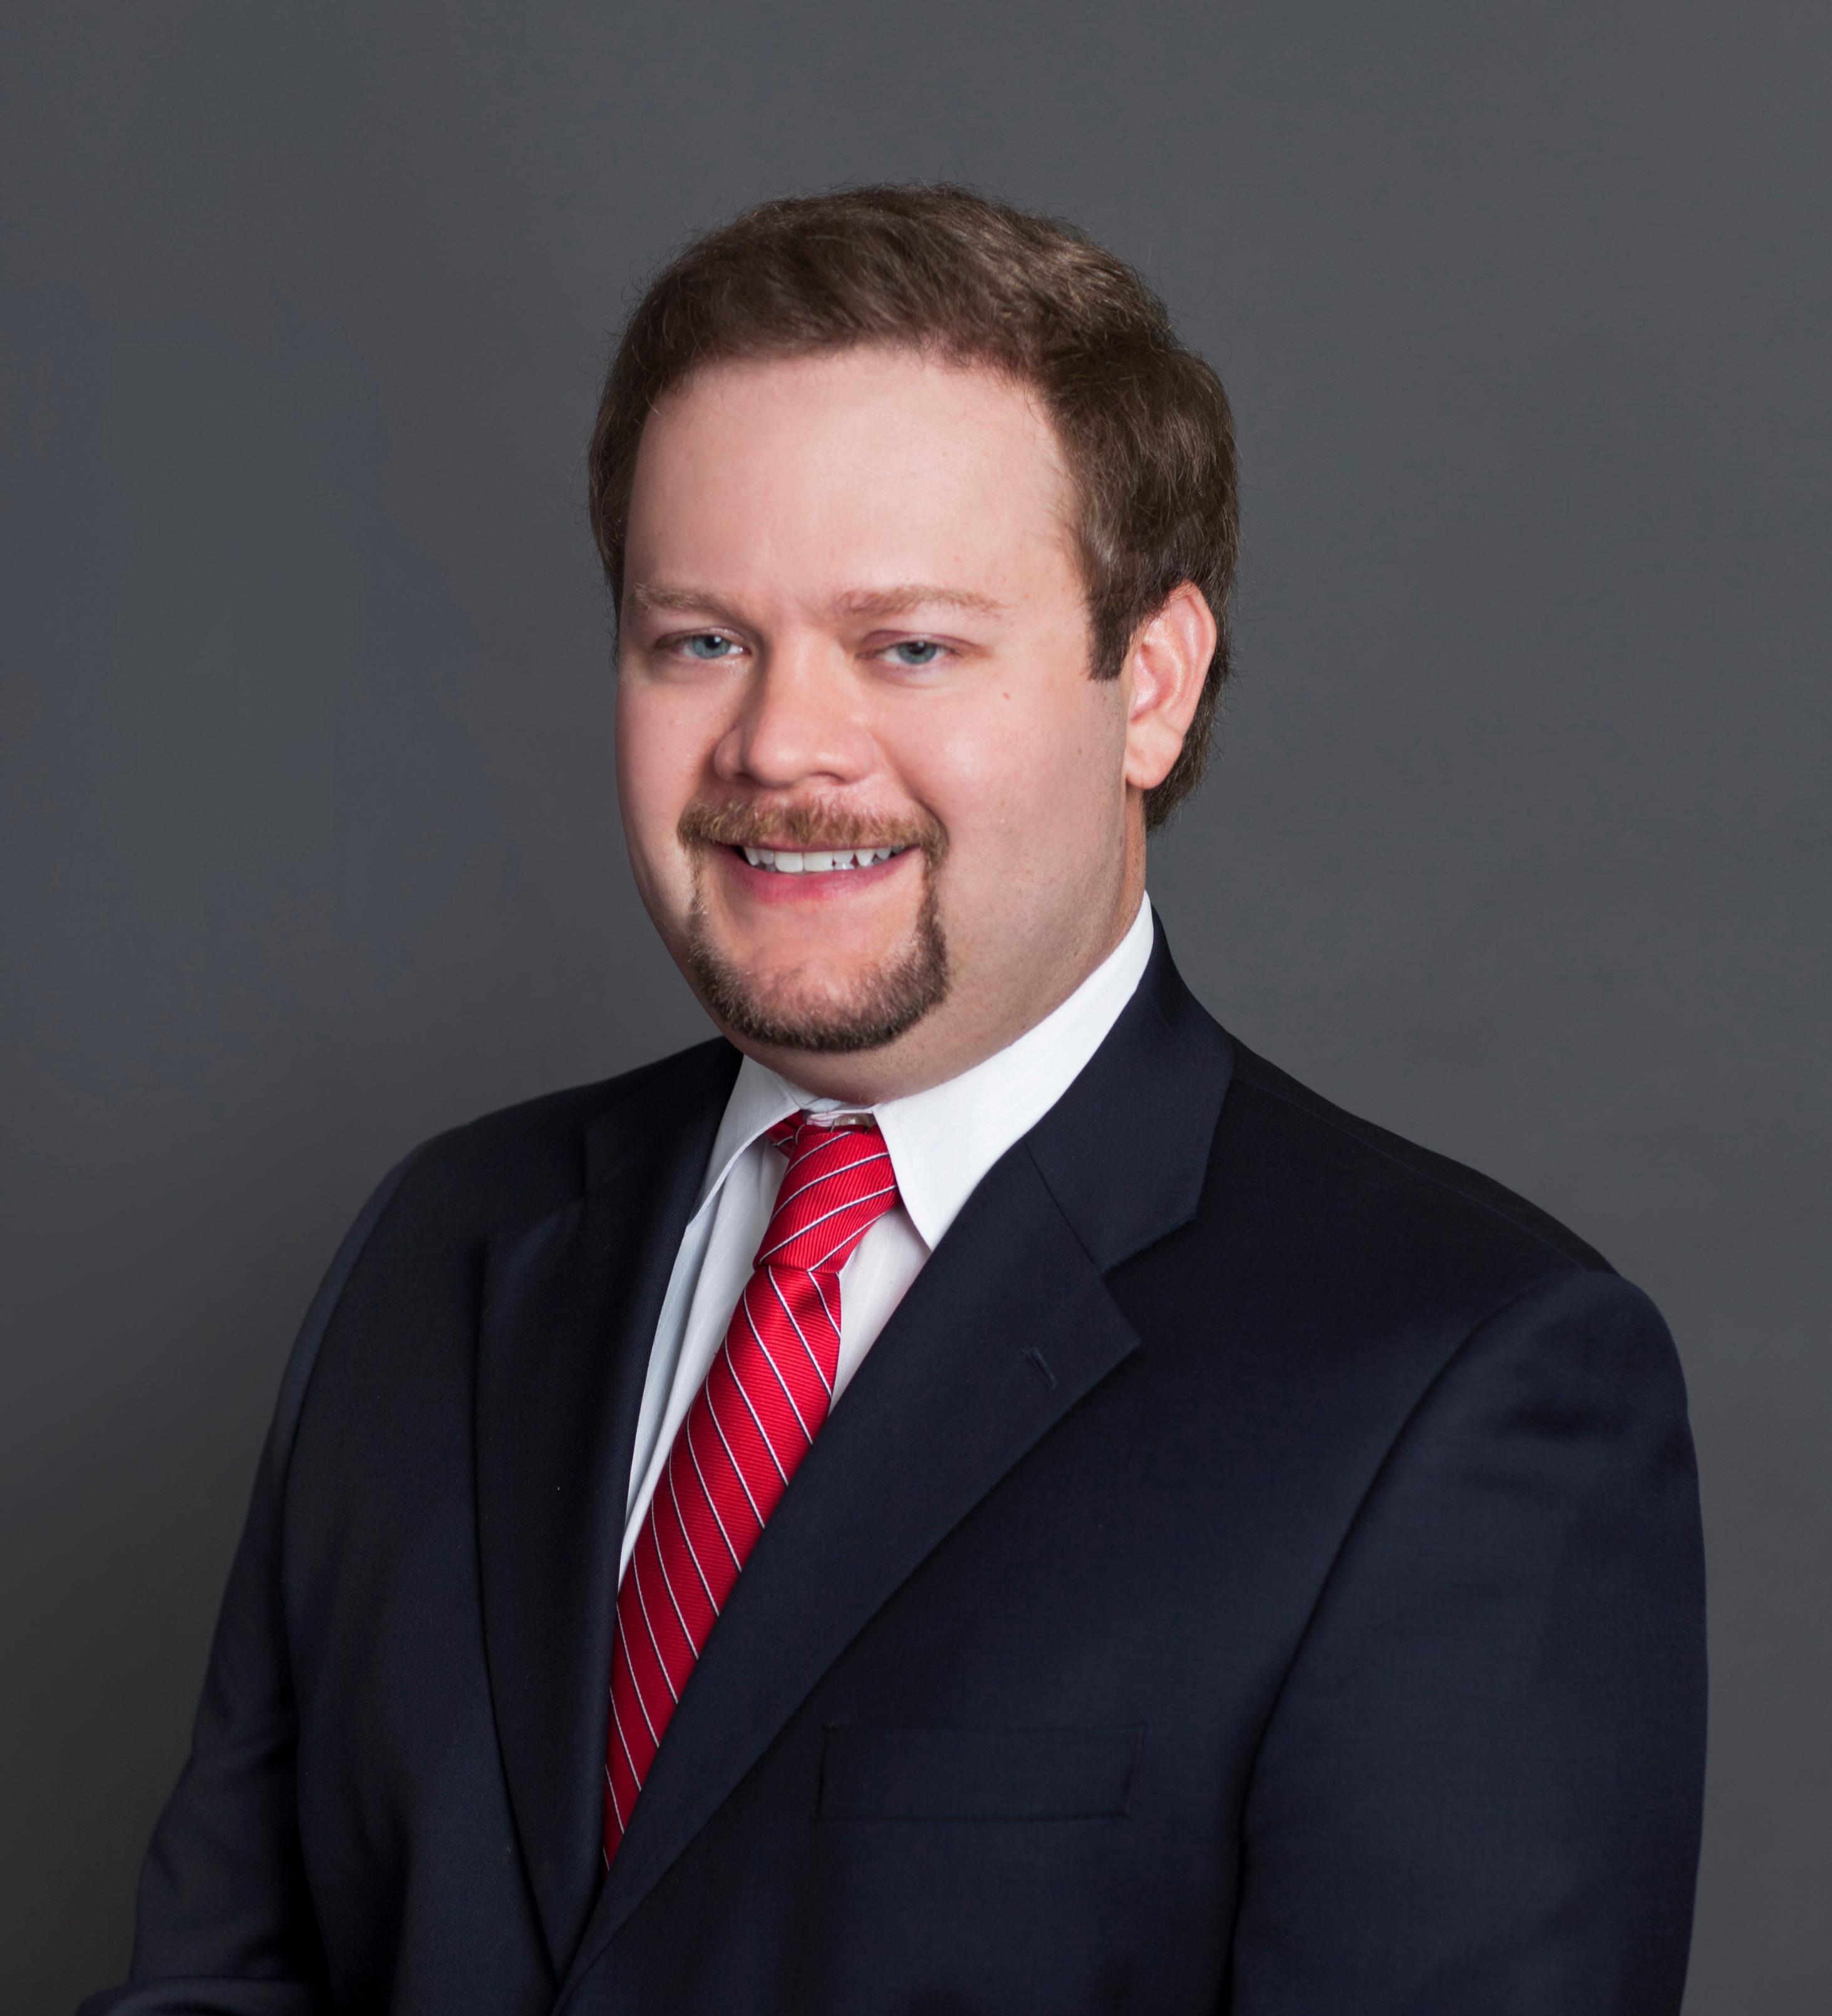 John M. Ransom's Profile Image